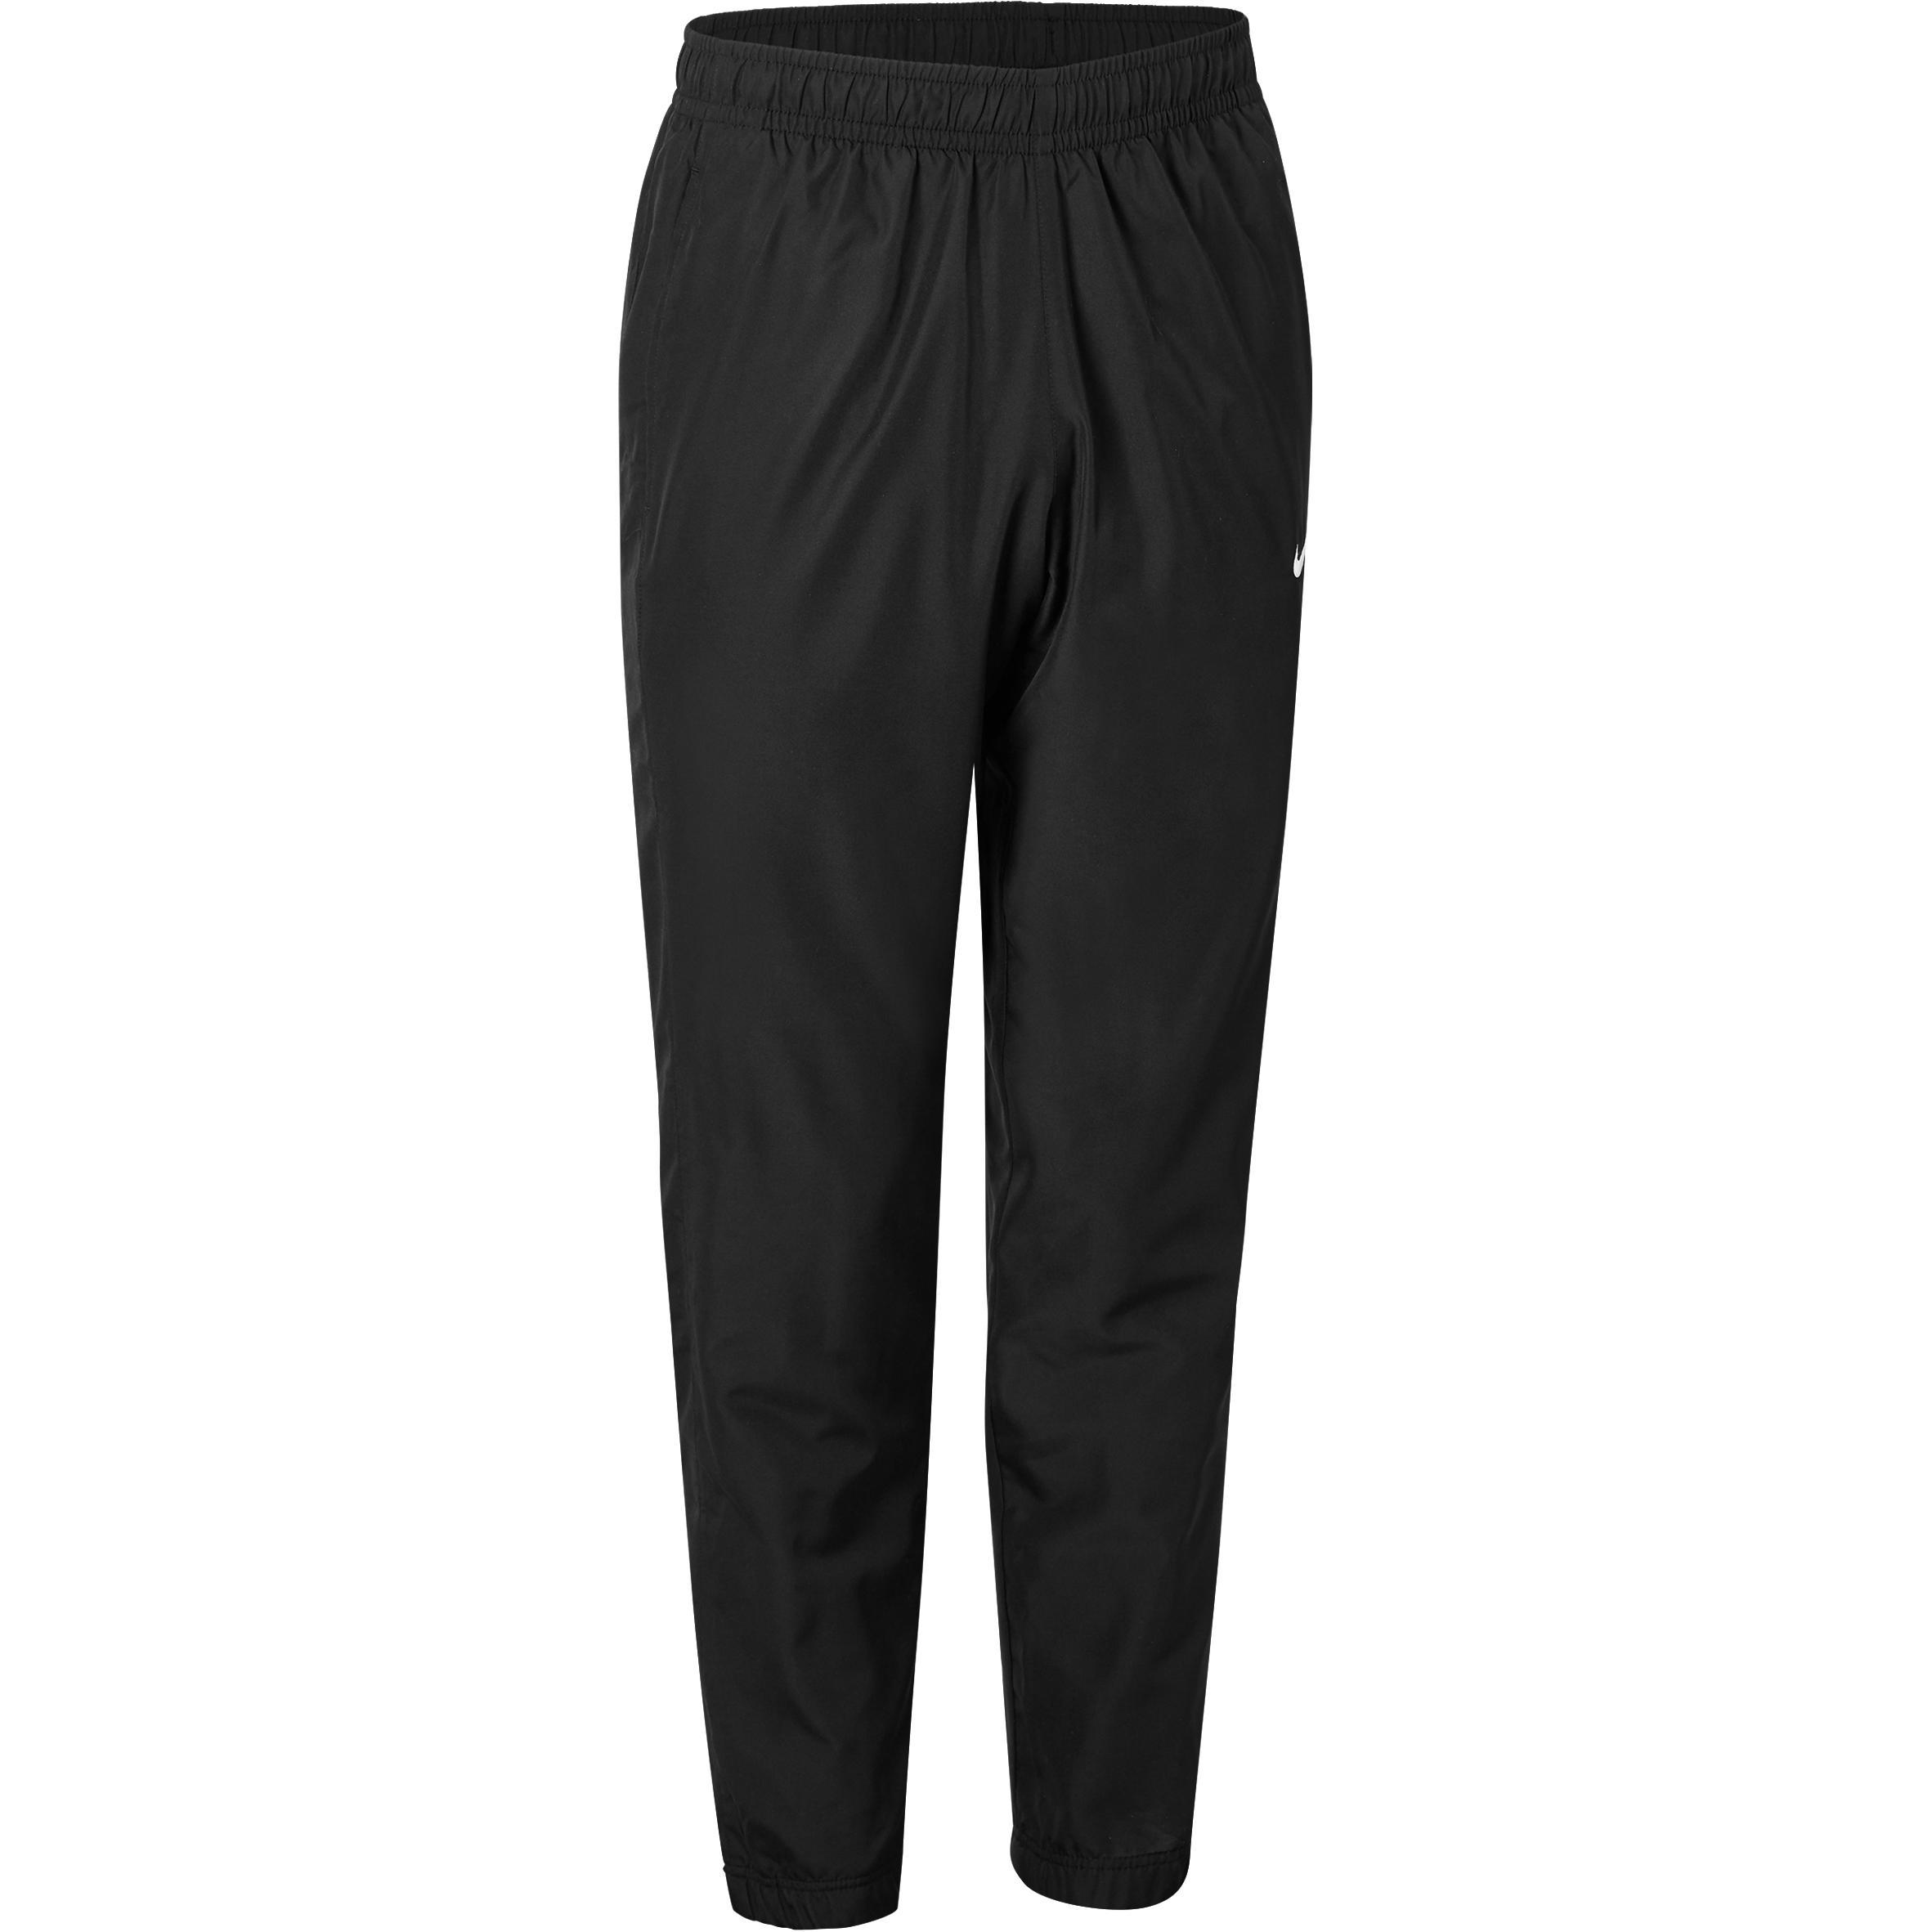 Heren fitnessbroek Nike Cuffed zwart